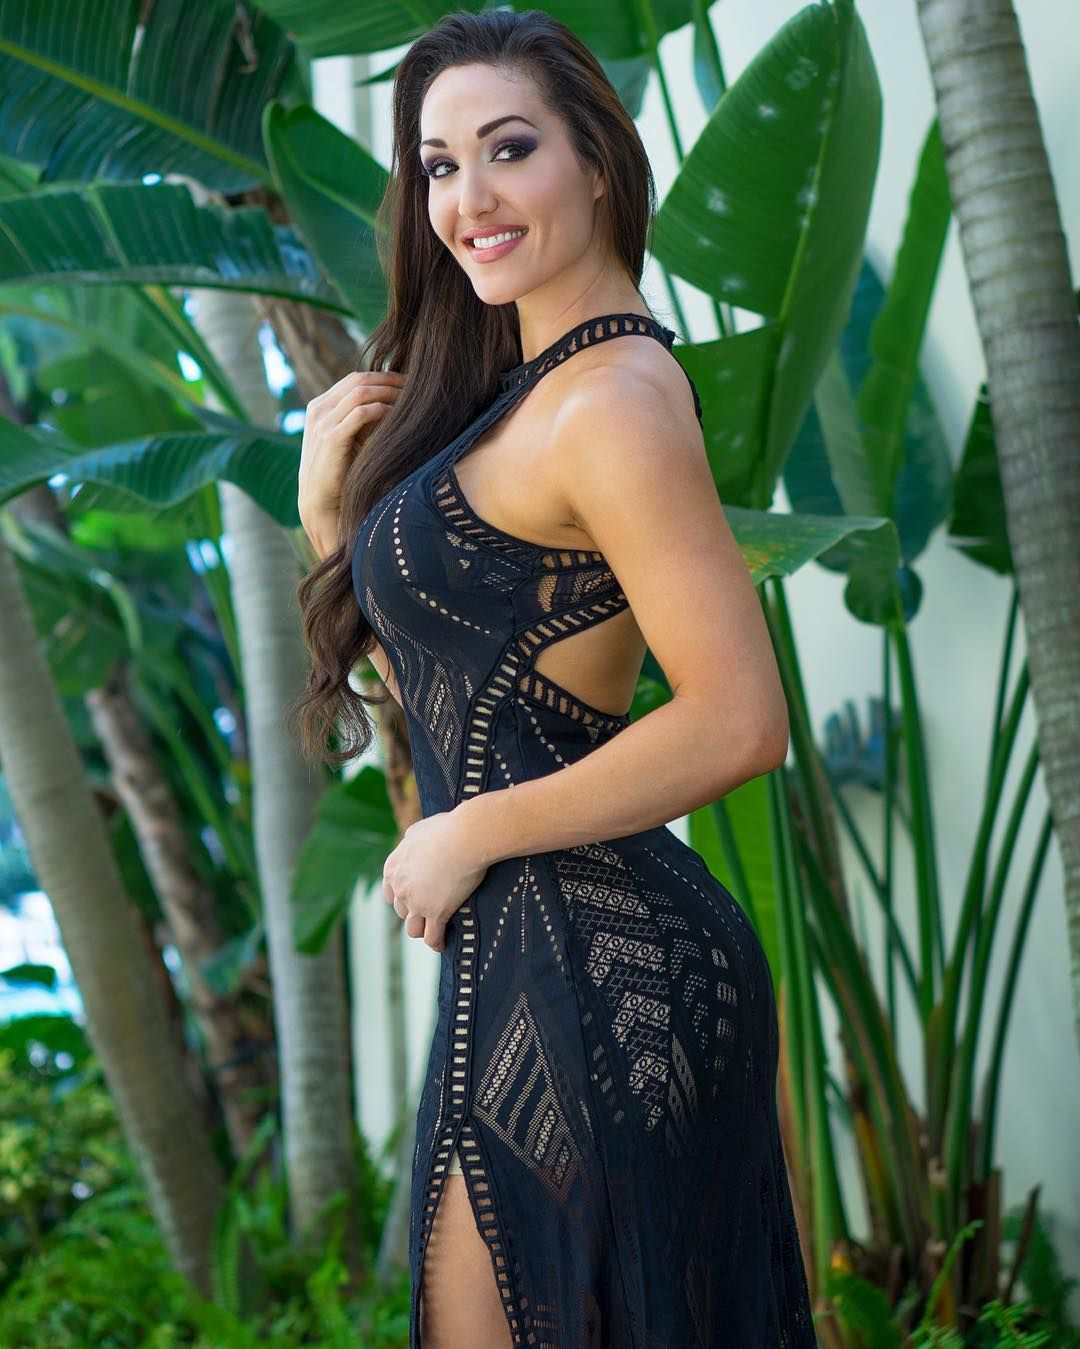 Instagram Gia Marie naked (19 photo), Tits, Bikini, Boobs, cleavage 2015